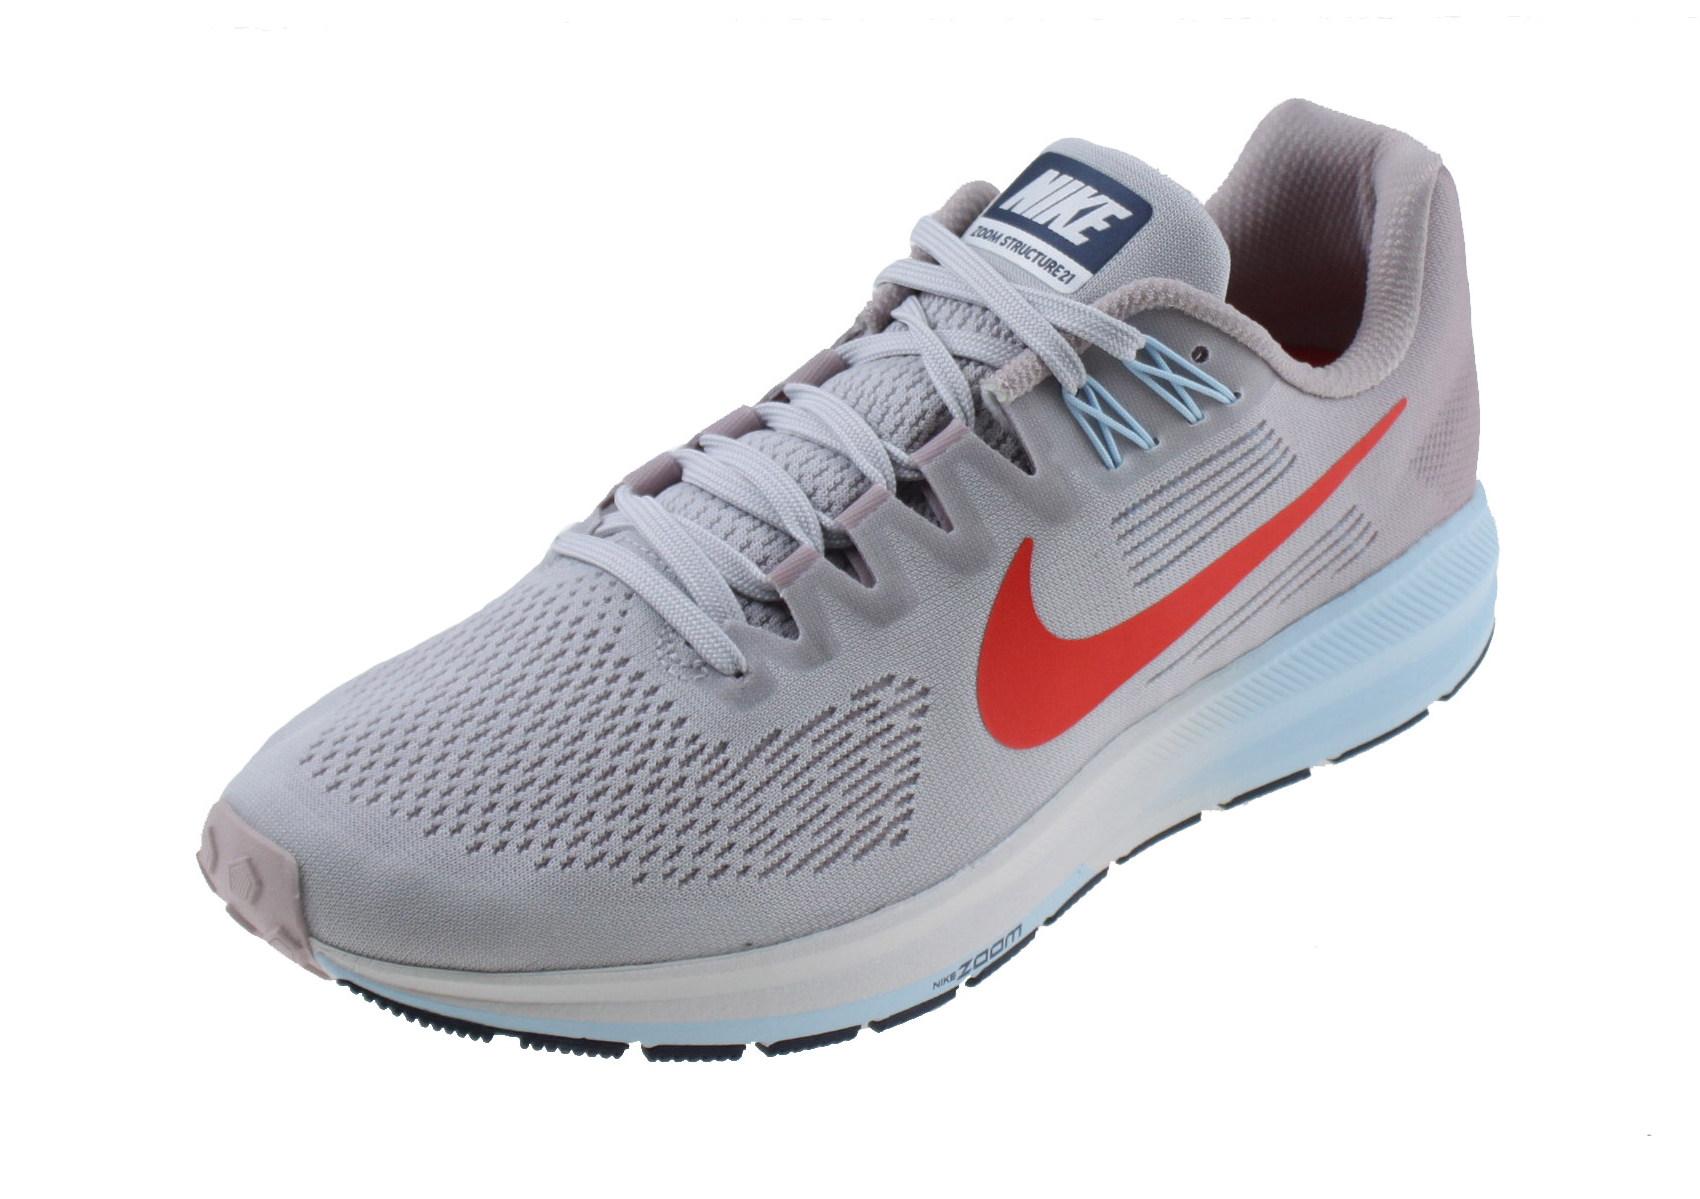 4ab294fd2f0 Nike Air Zoom Structure 21 Dames Hardloopschoen. 904701 006 Vast Grey/Elemental  Rose Cobalt Tint Habanero Red